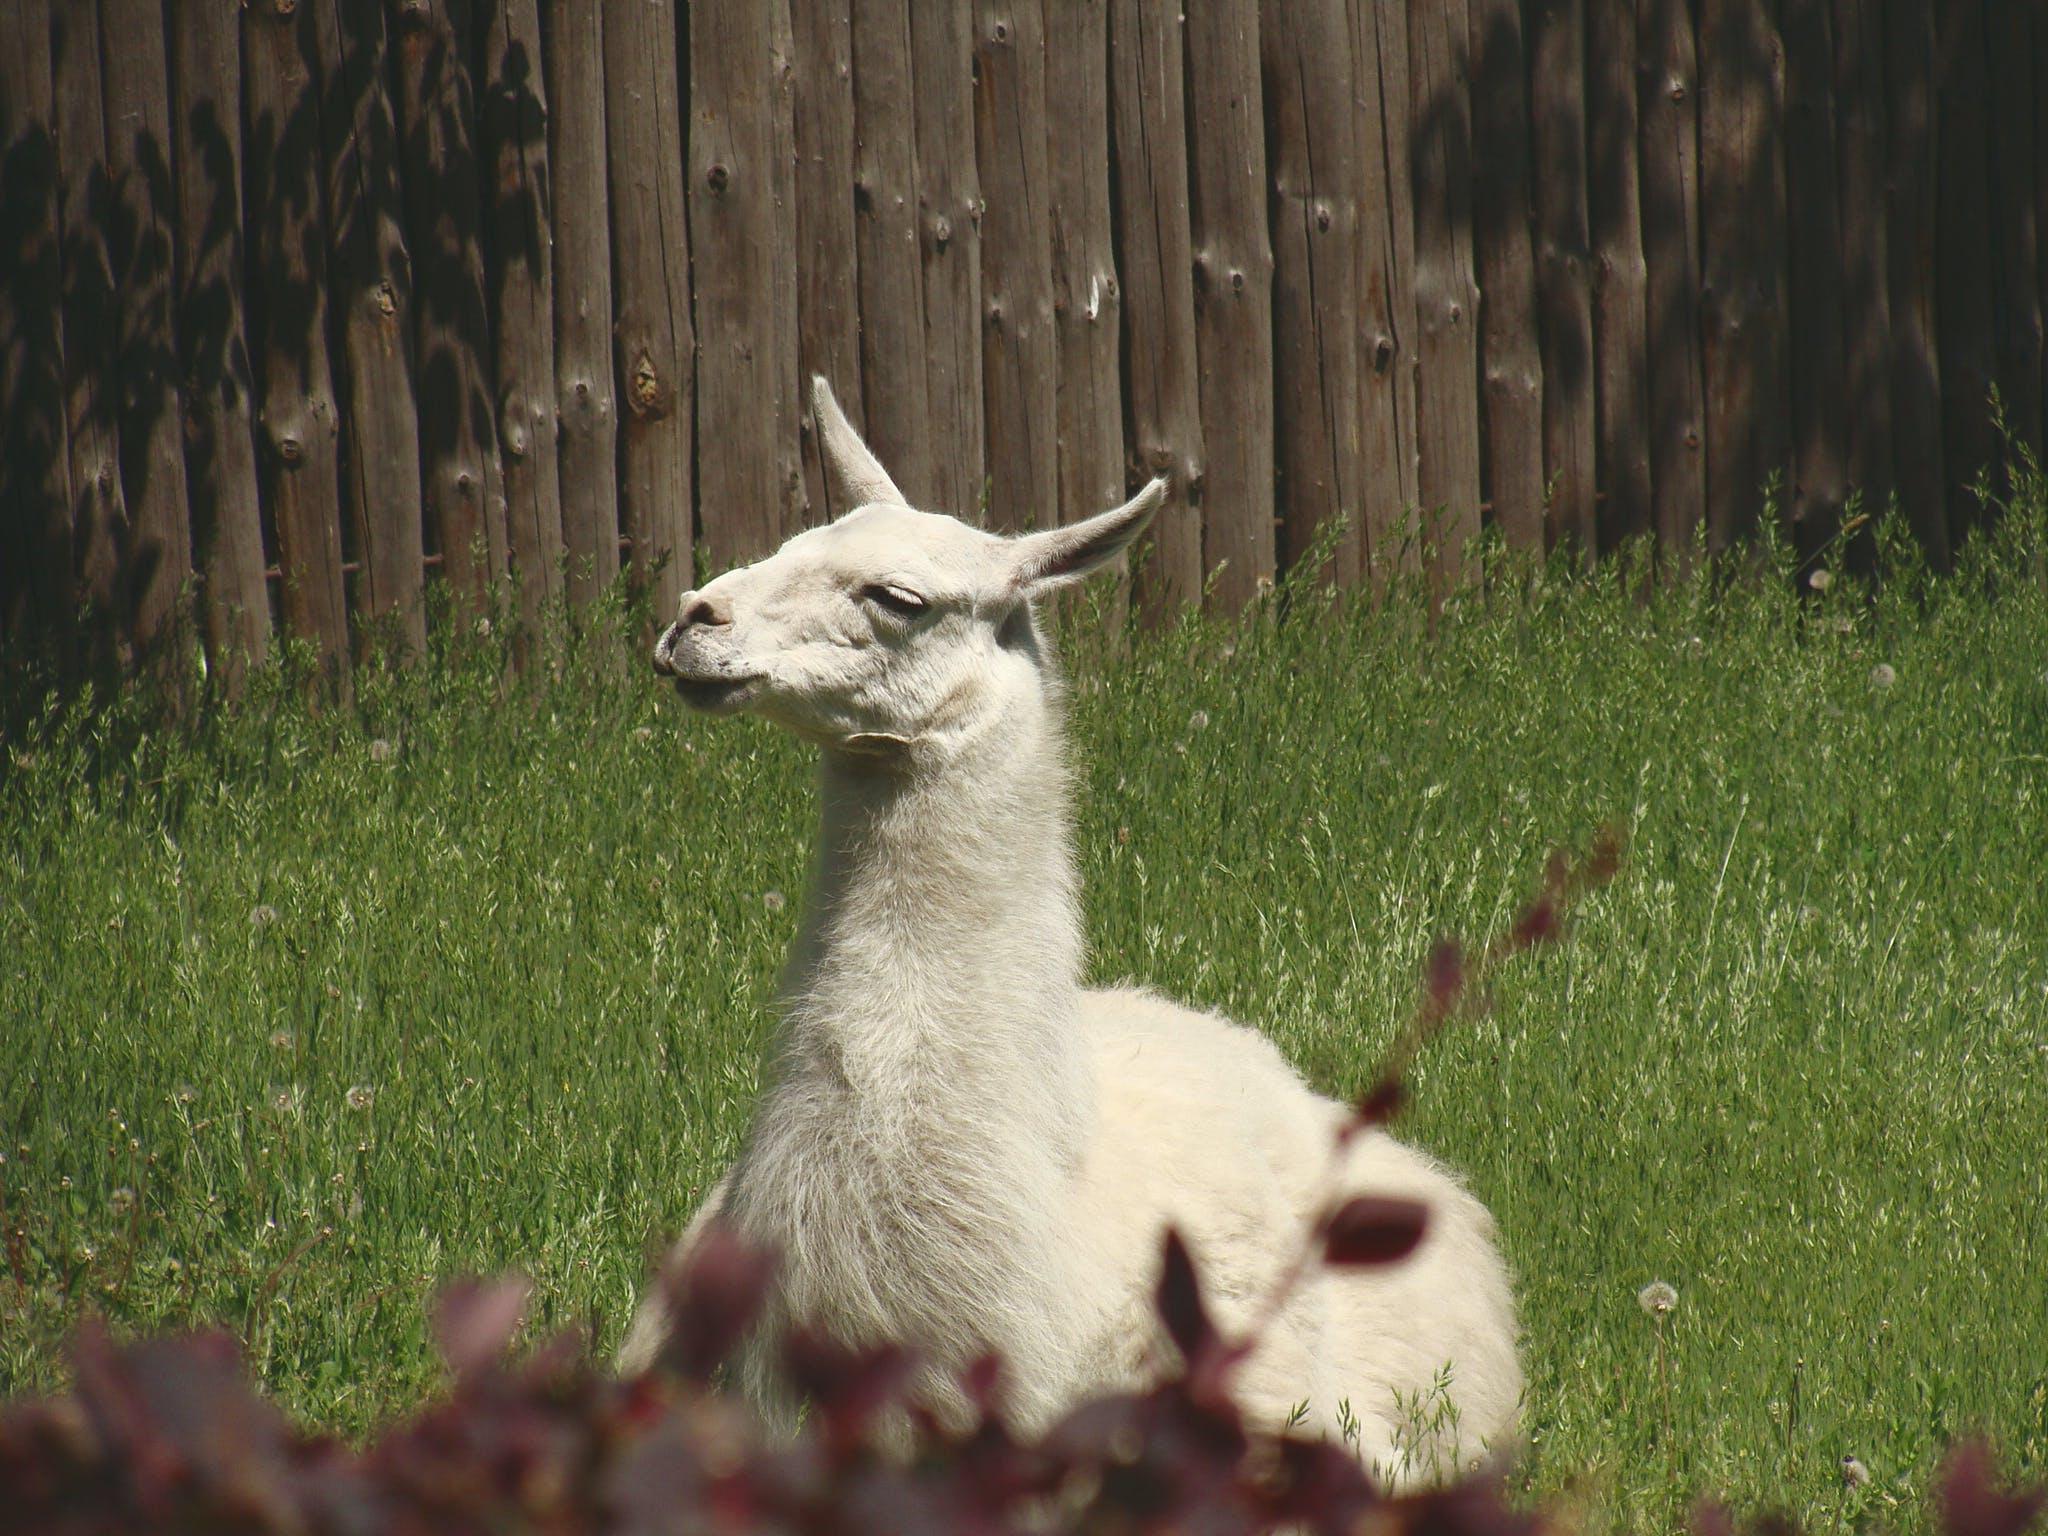 White Llama Lying on Green Grass Under Sunny Sky during Daytime